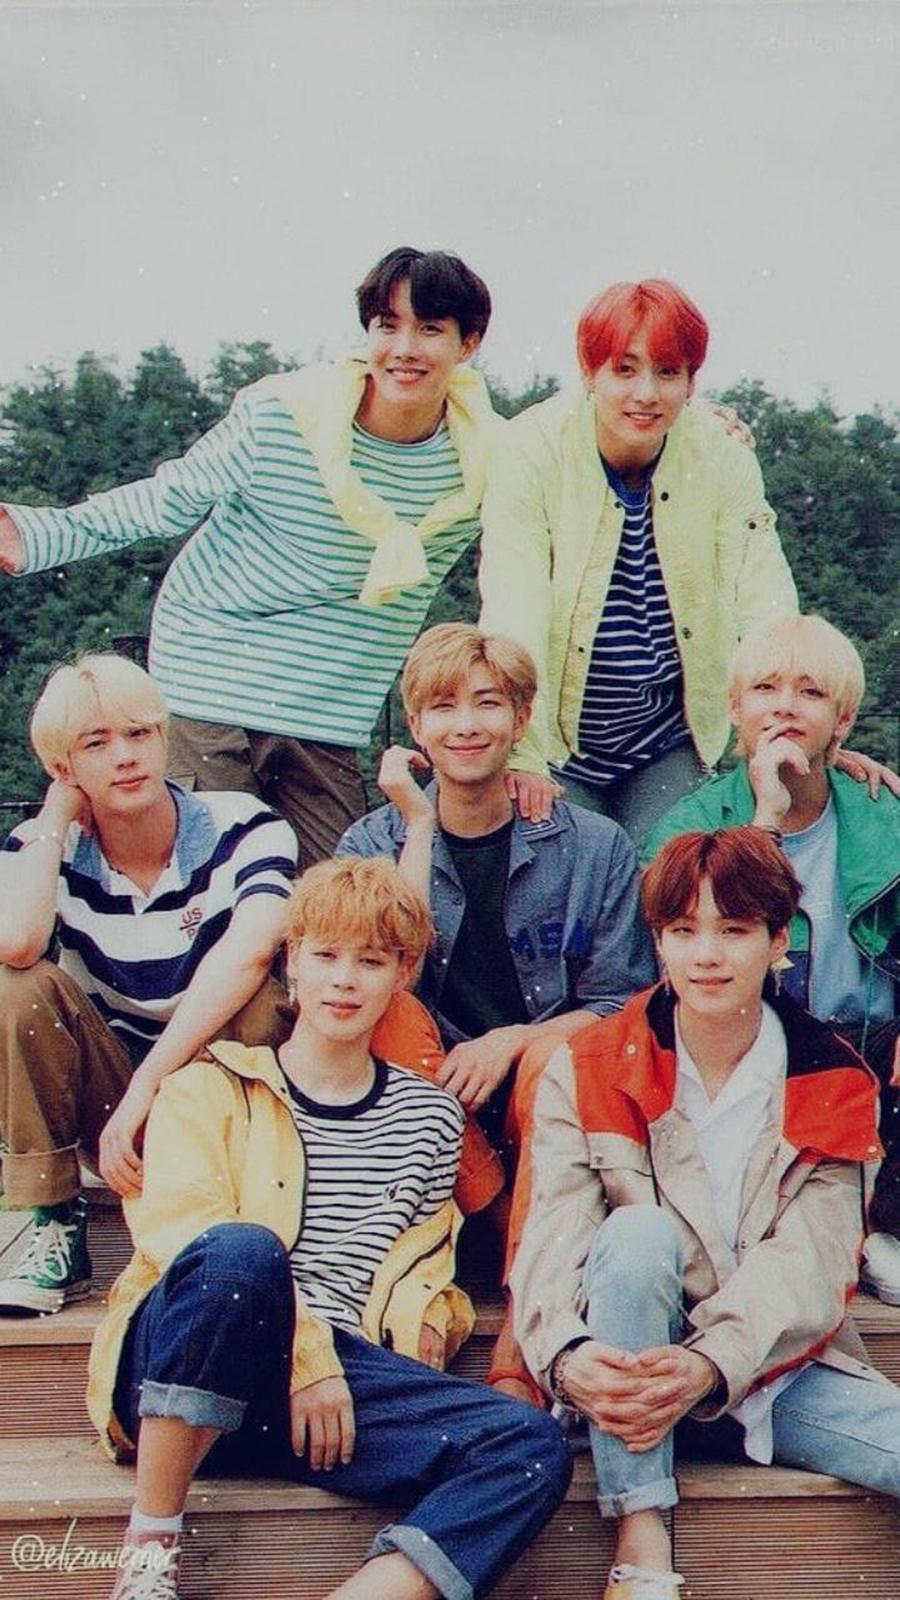 New BTS Wallpaper – Korean Group BTS Wallpapers Free Download